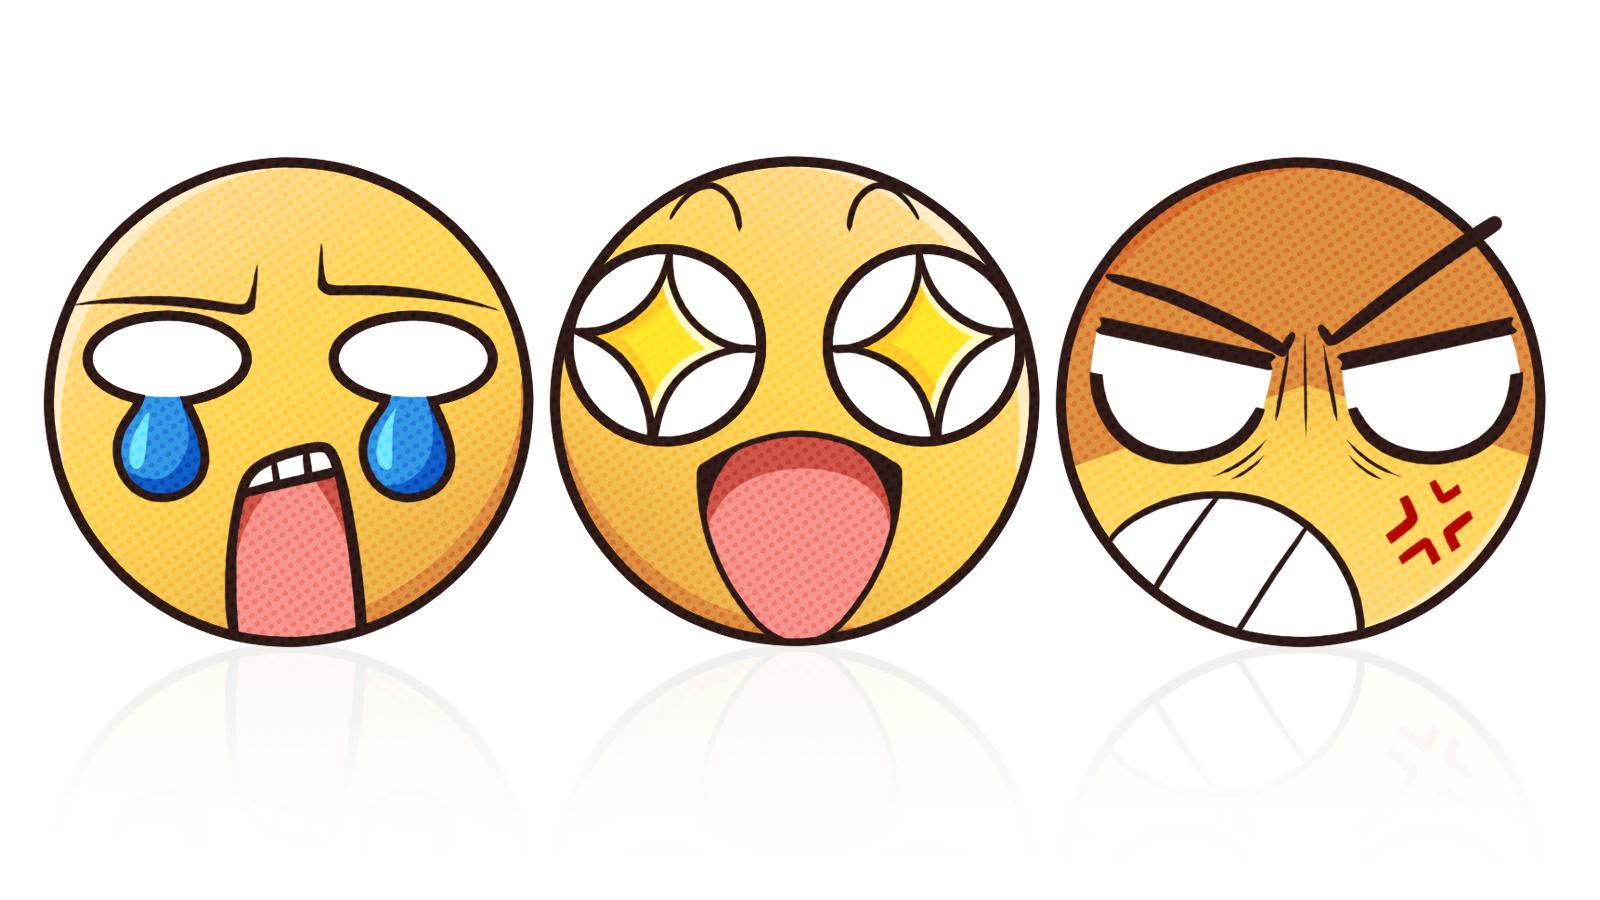 Conseils Comment Creer Des Emoticones Impressionnantes Tips 1 Par Nathanpuray Clip Studio Tips